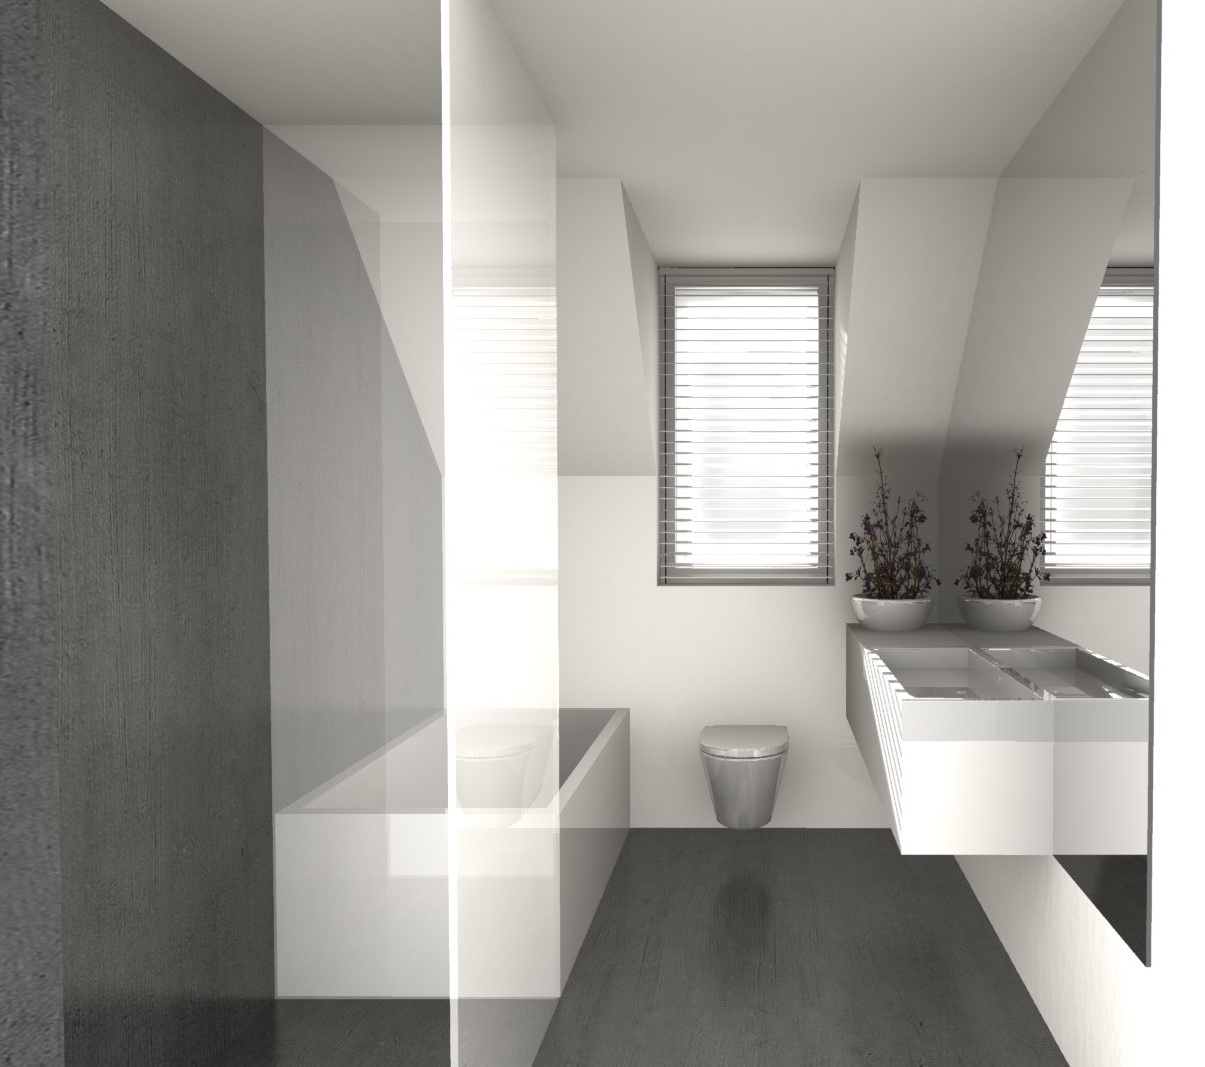 annemarieke_van_dooren_architect_moderne_badkamer_klein_1.jpg